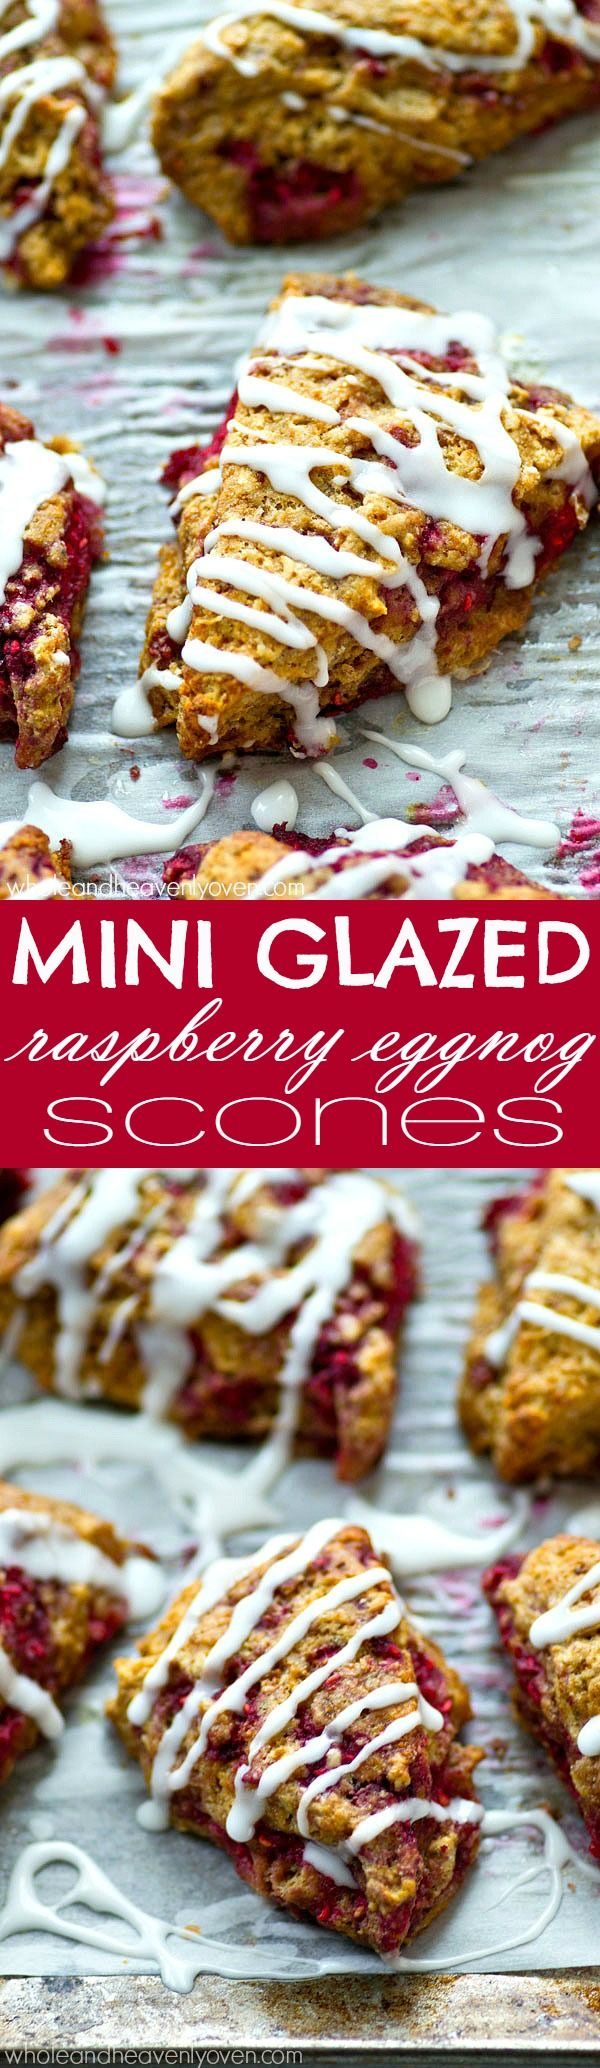 Mini Glazed Raspberry Eggnog Scones   Recipe